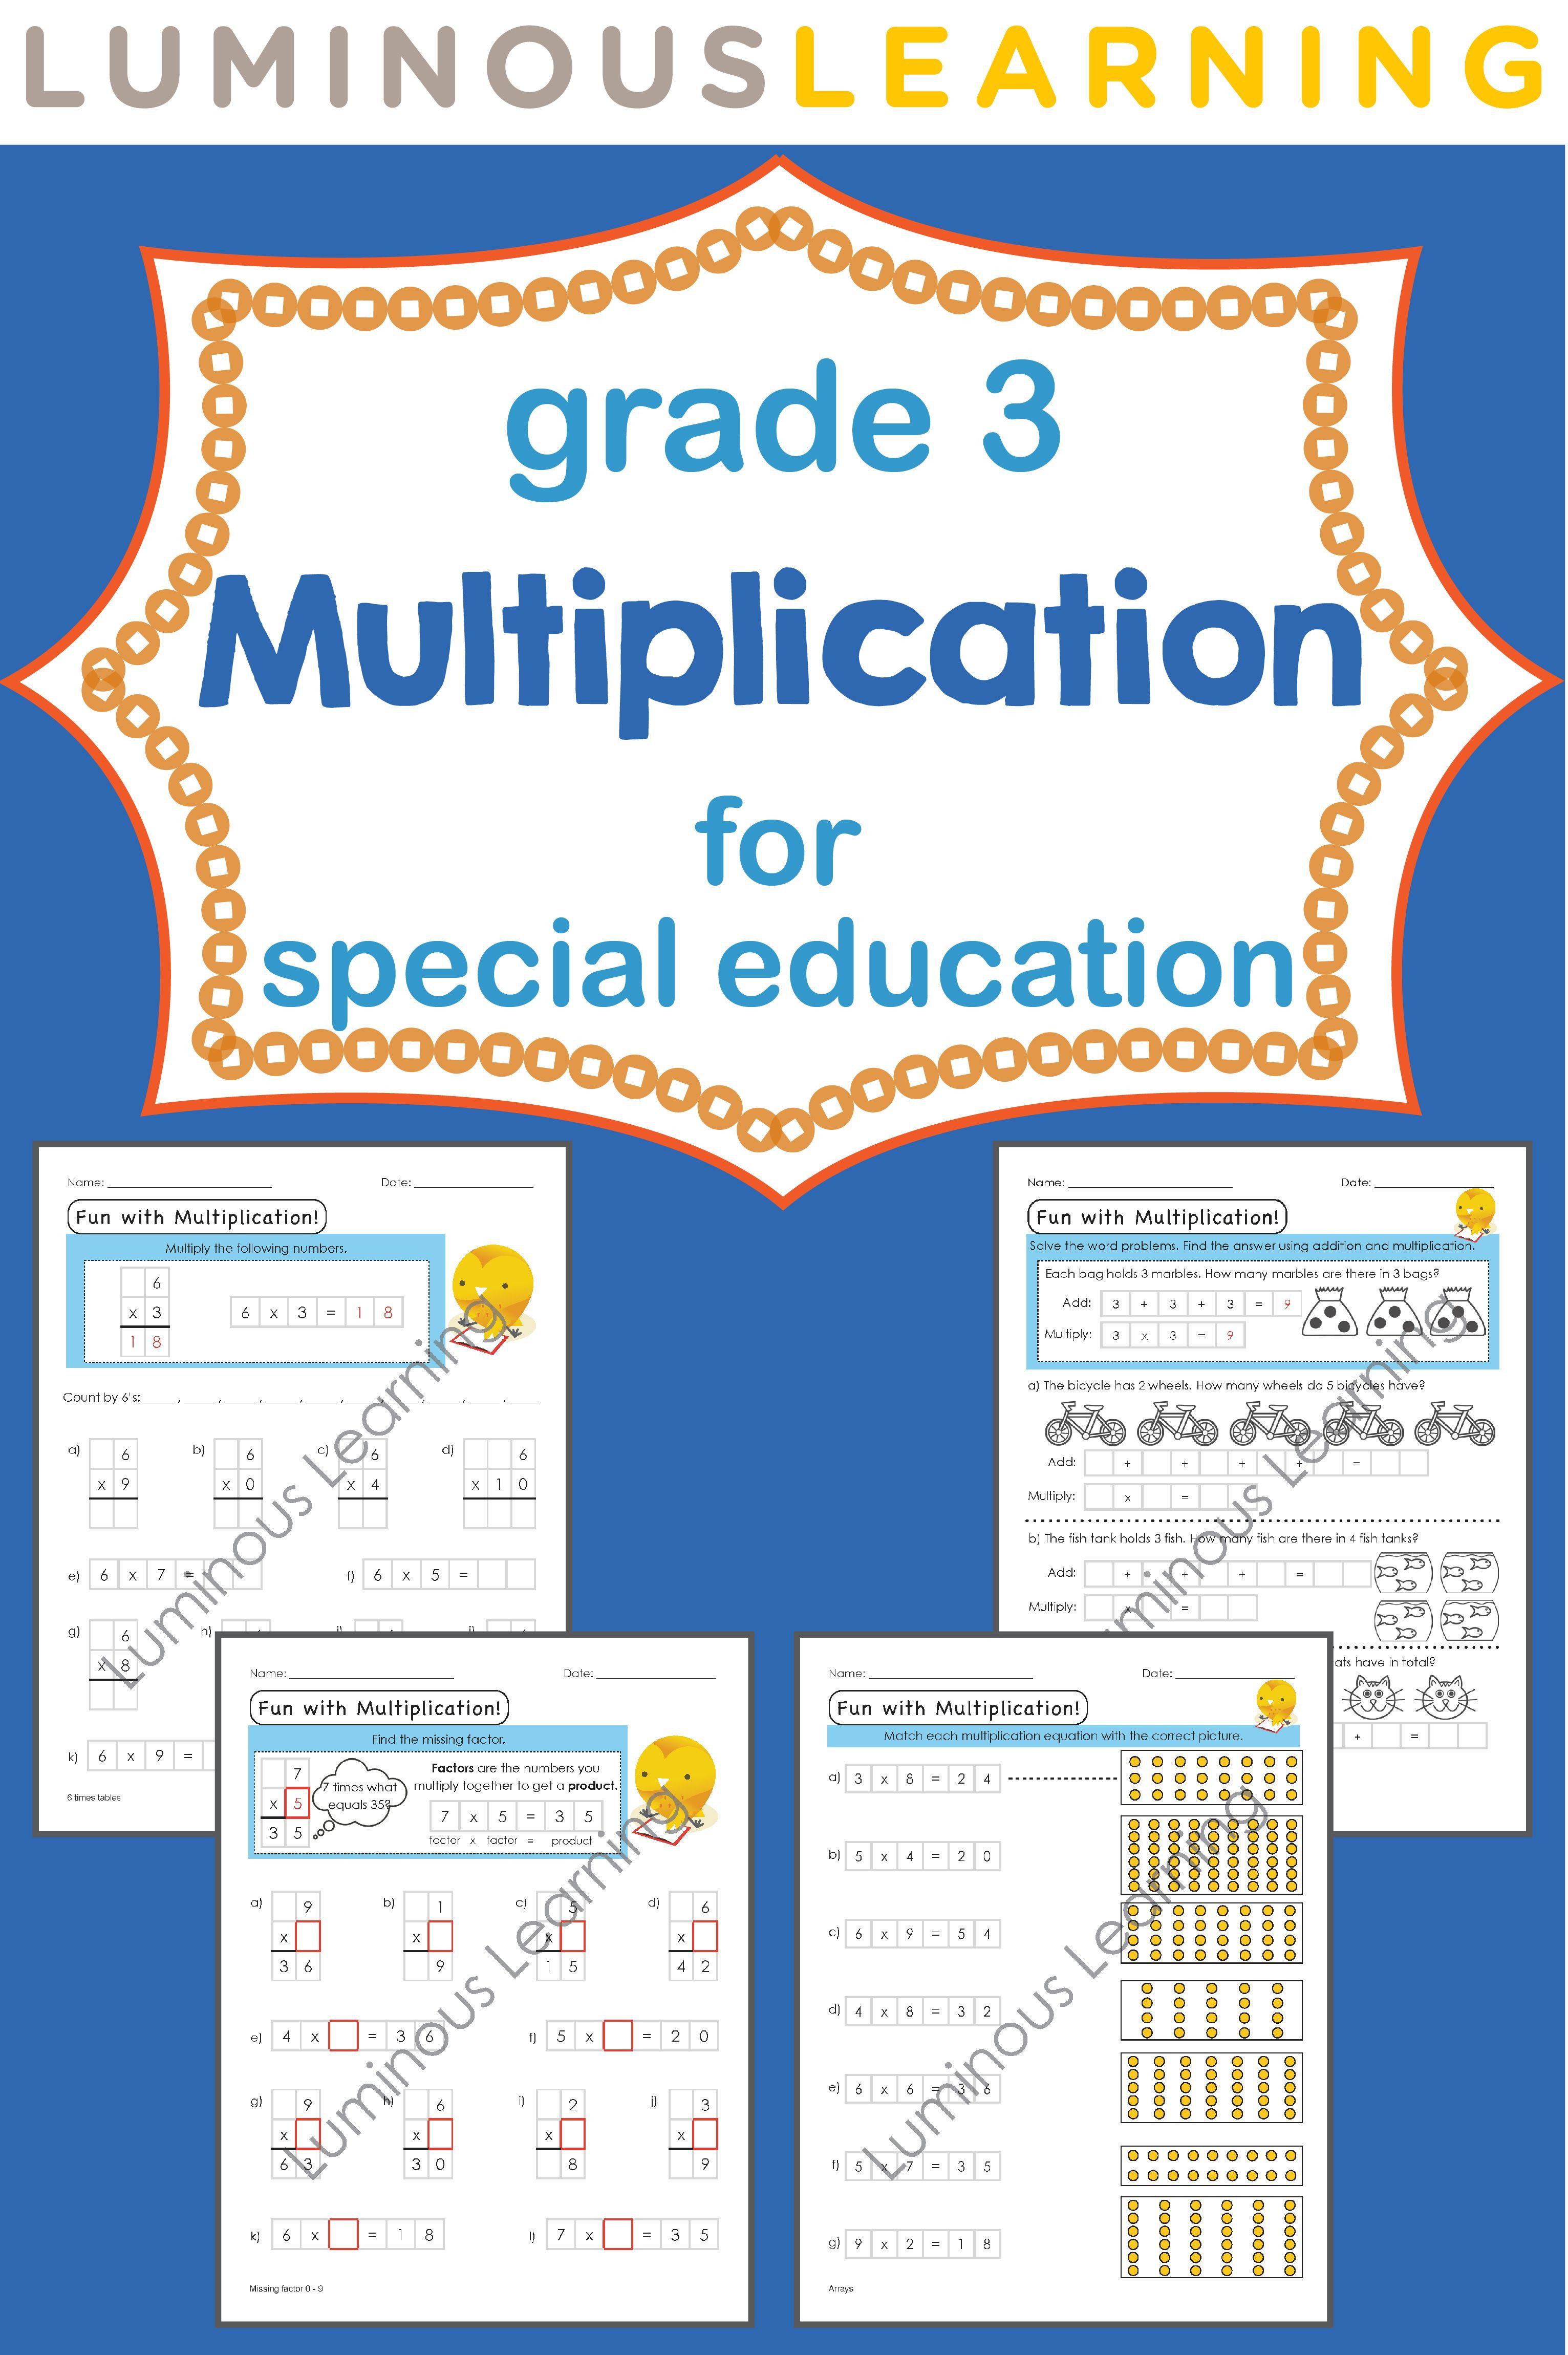 Grade 3 Multiplication Printable Workbook | Visual aids ...